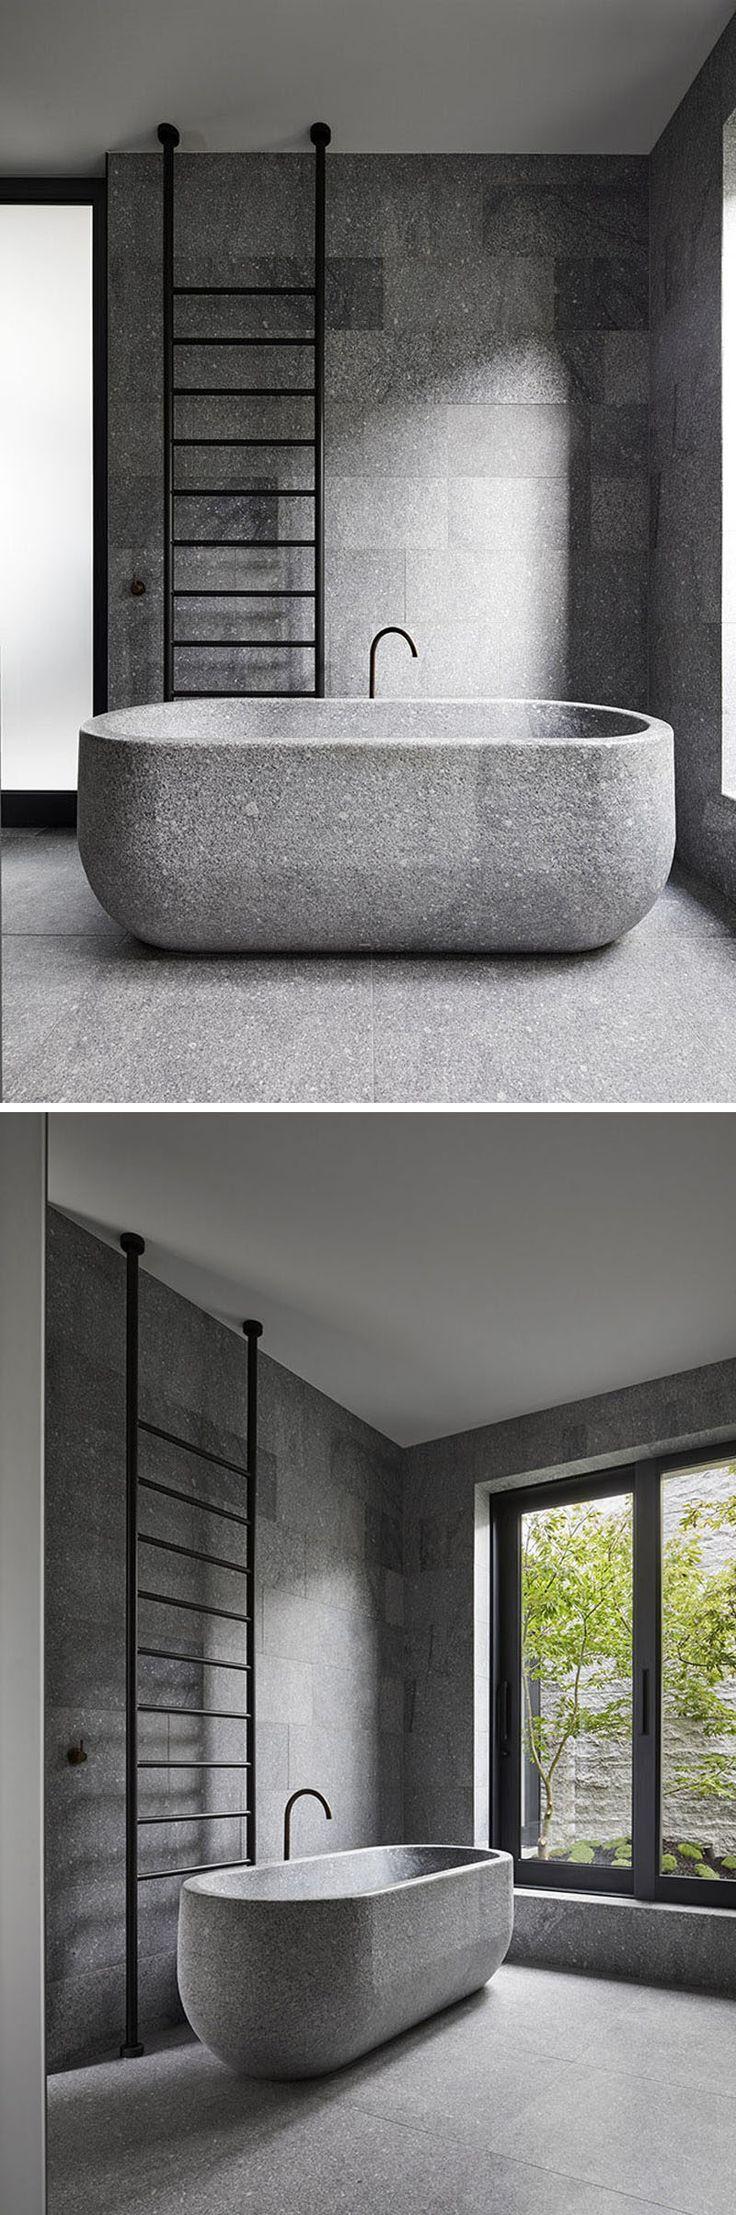 Awesome towel rail